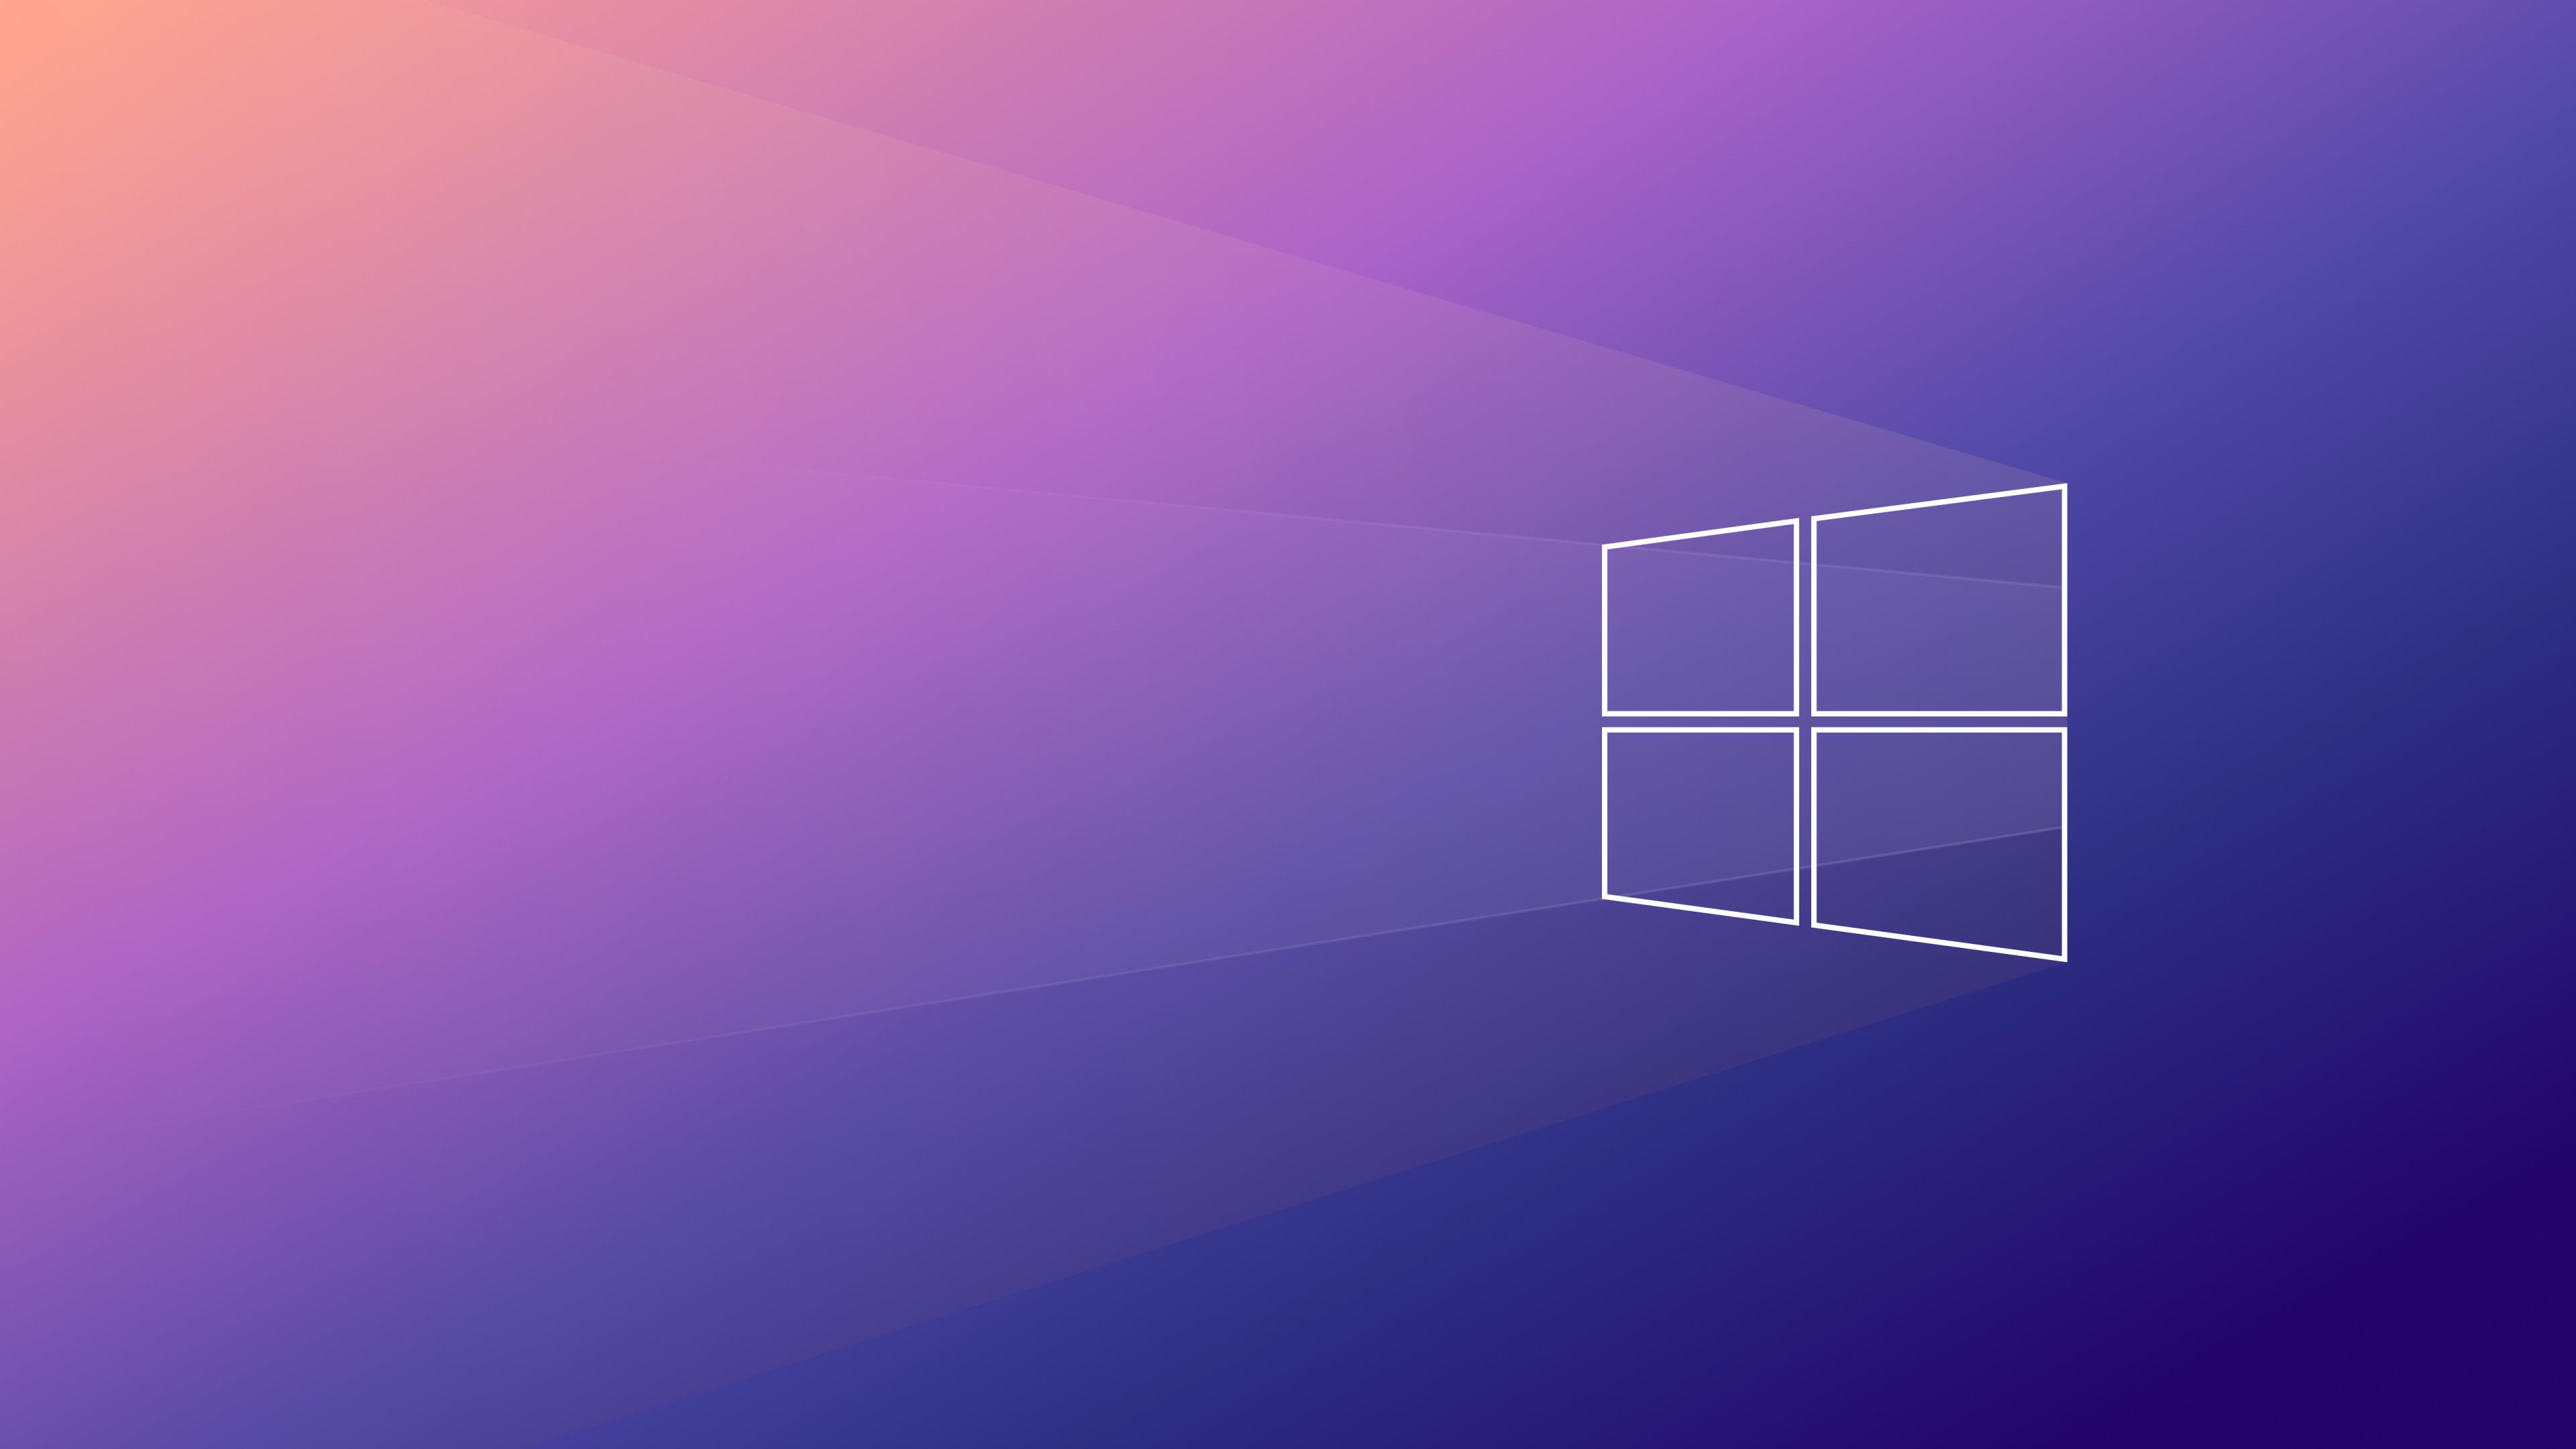 Windows 10 4k Wallpaper Gradient Background Minimal 5k Technology 2218